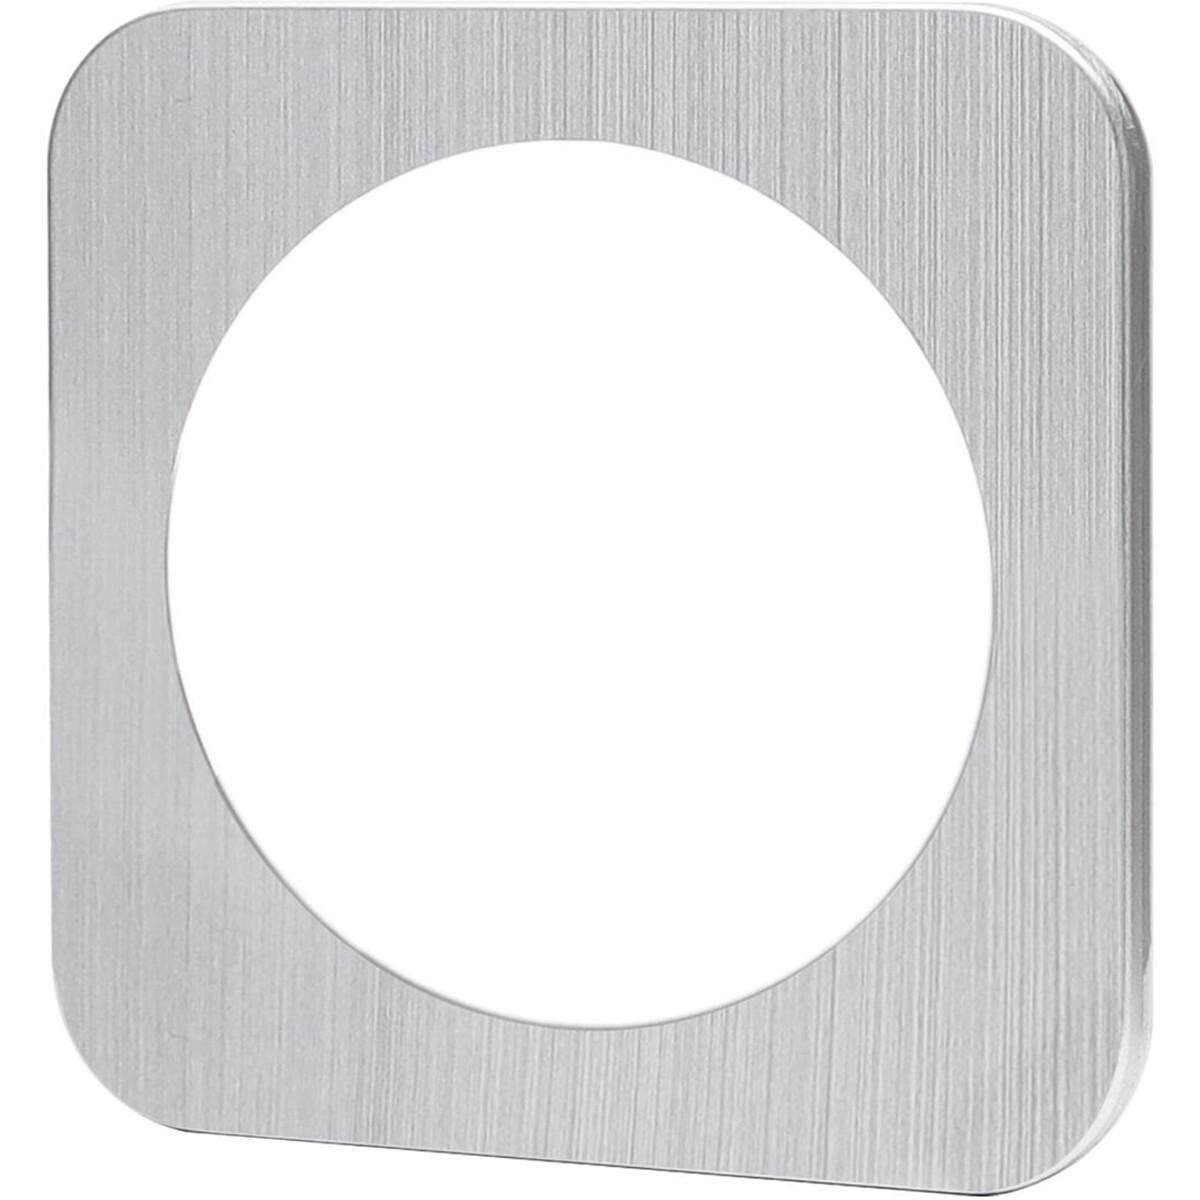 Afdekraam - Aigi Jura - 1-voudig - Rond - Aluminium - Zilver